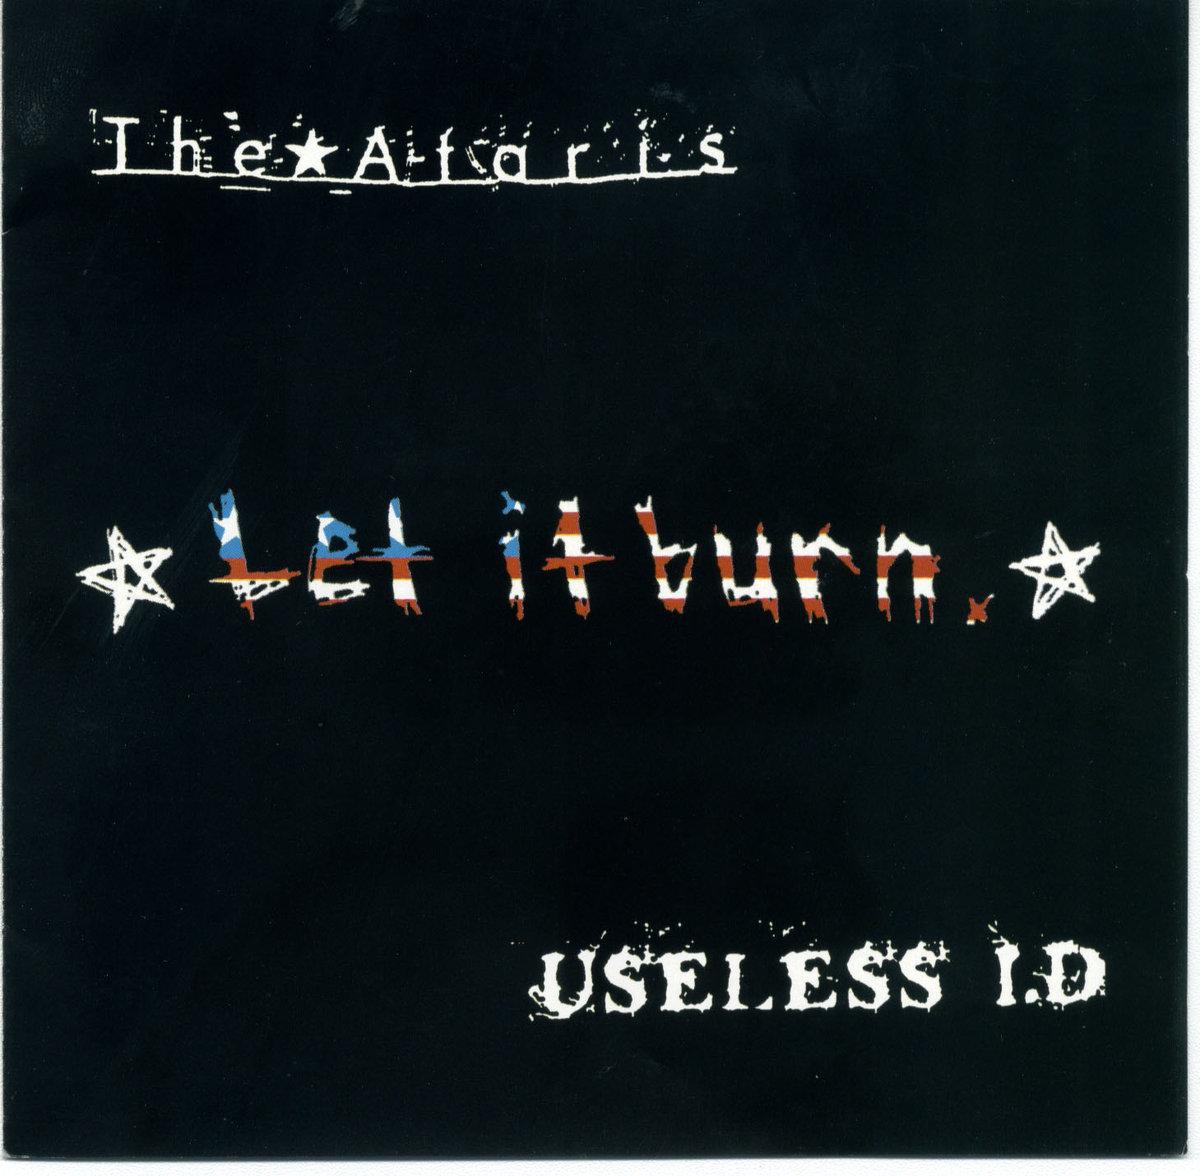 The Ataris / Useless ID - Let it Burn Split 12